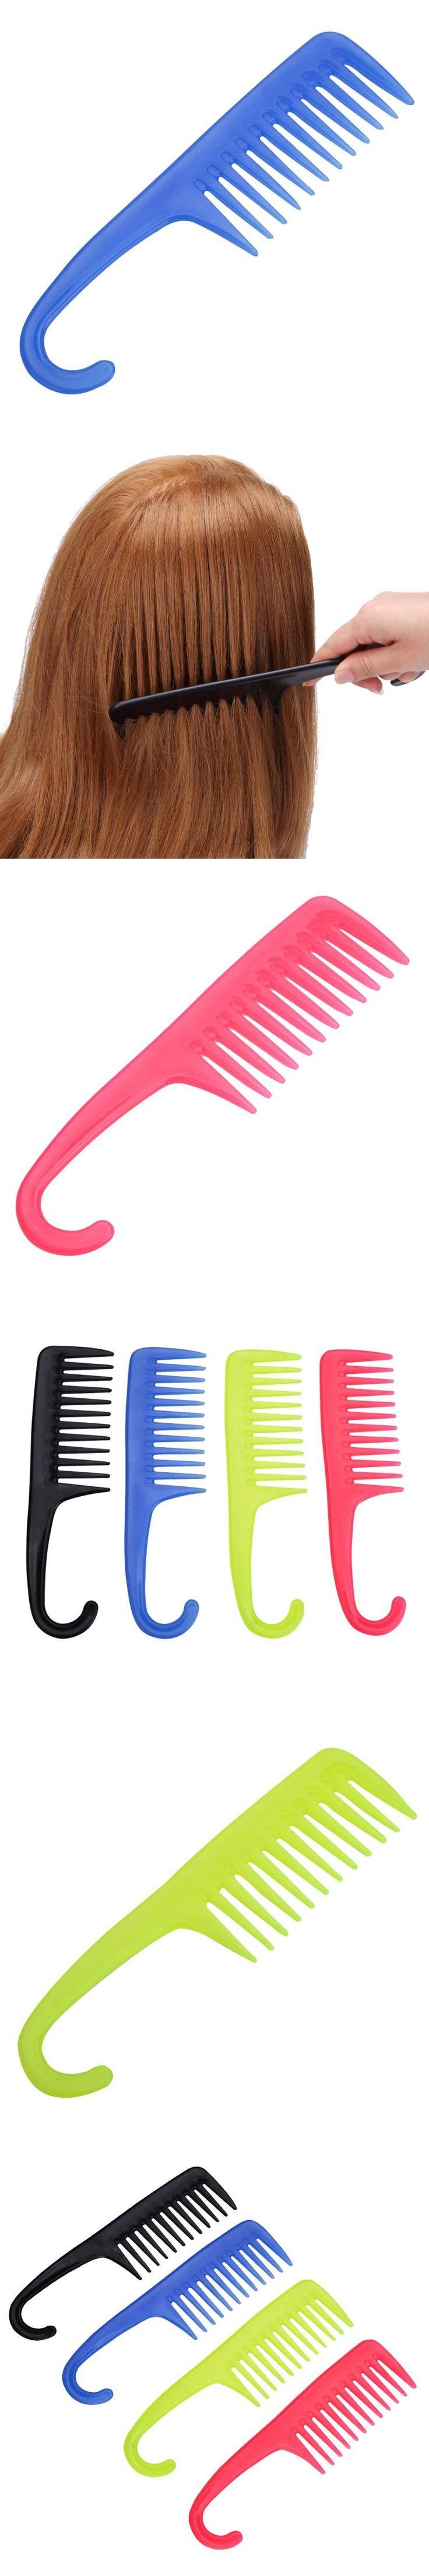 1PC Hair Styling Comb Set Professional Black Hairdressing Brush Salon Barbers detangling wig hair brush horn comb haarverf kam